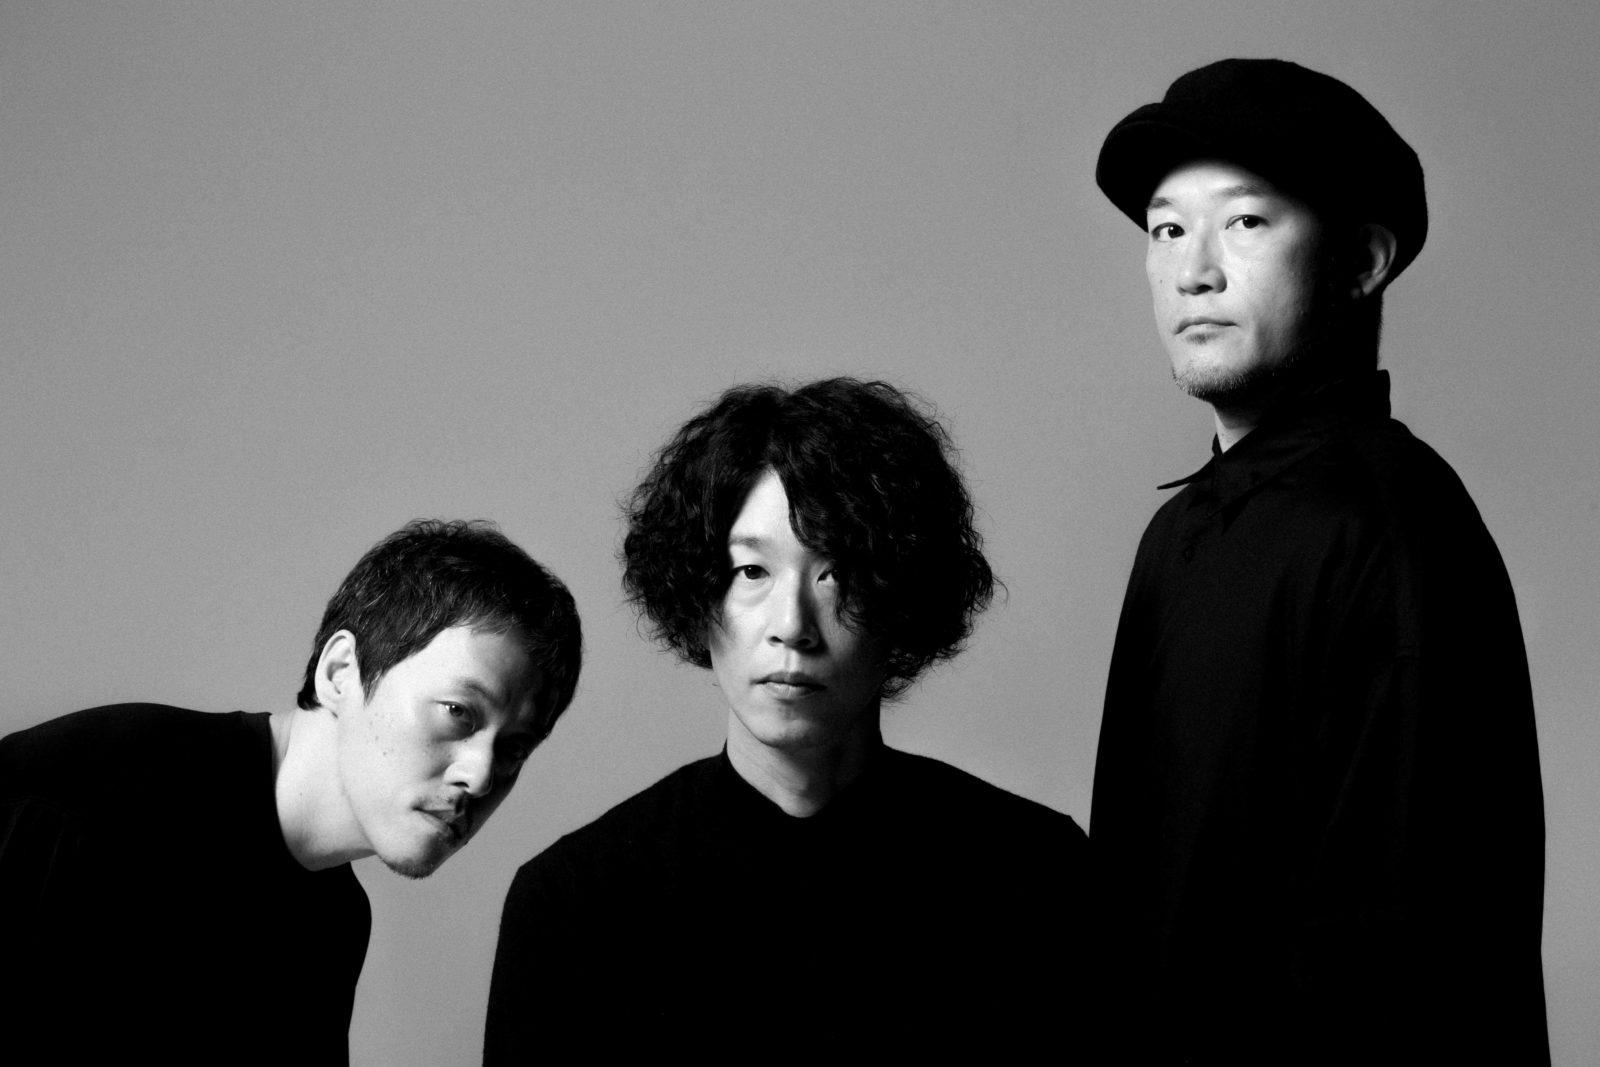 GRAPEVINE、2019年秋の東名阪ワンマンツアー「GRAPEVINE FALL TOUR」開催決定サムネイル画像